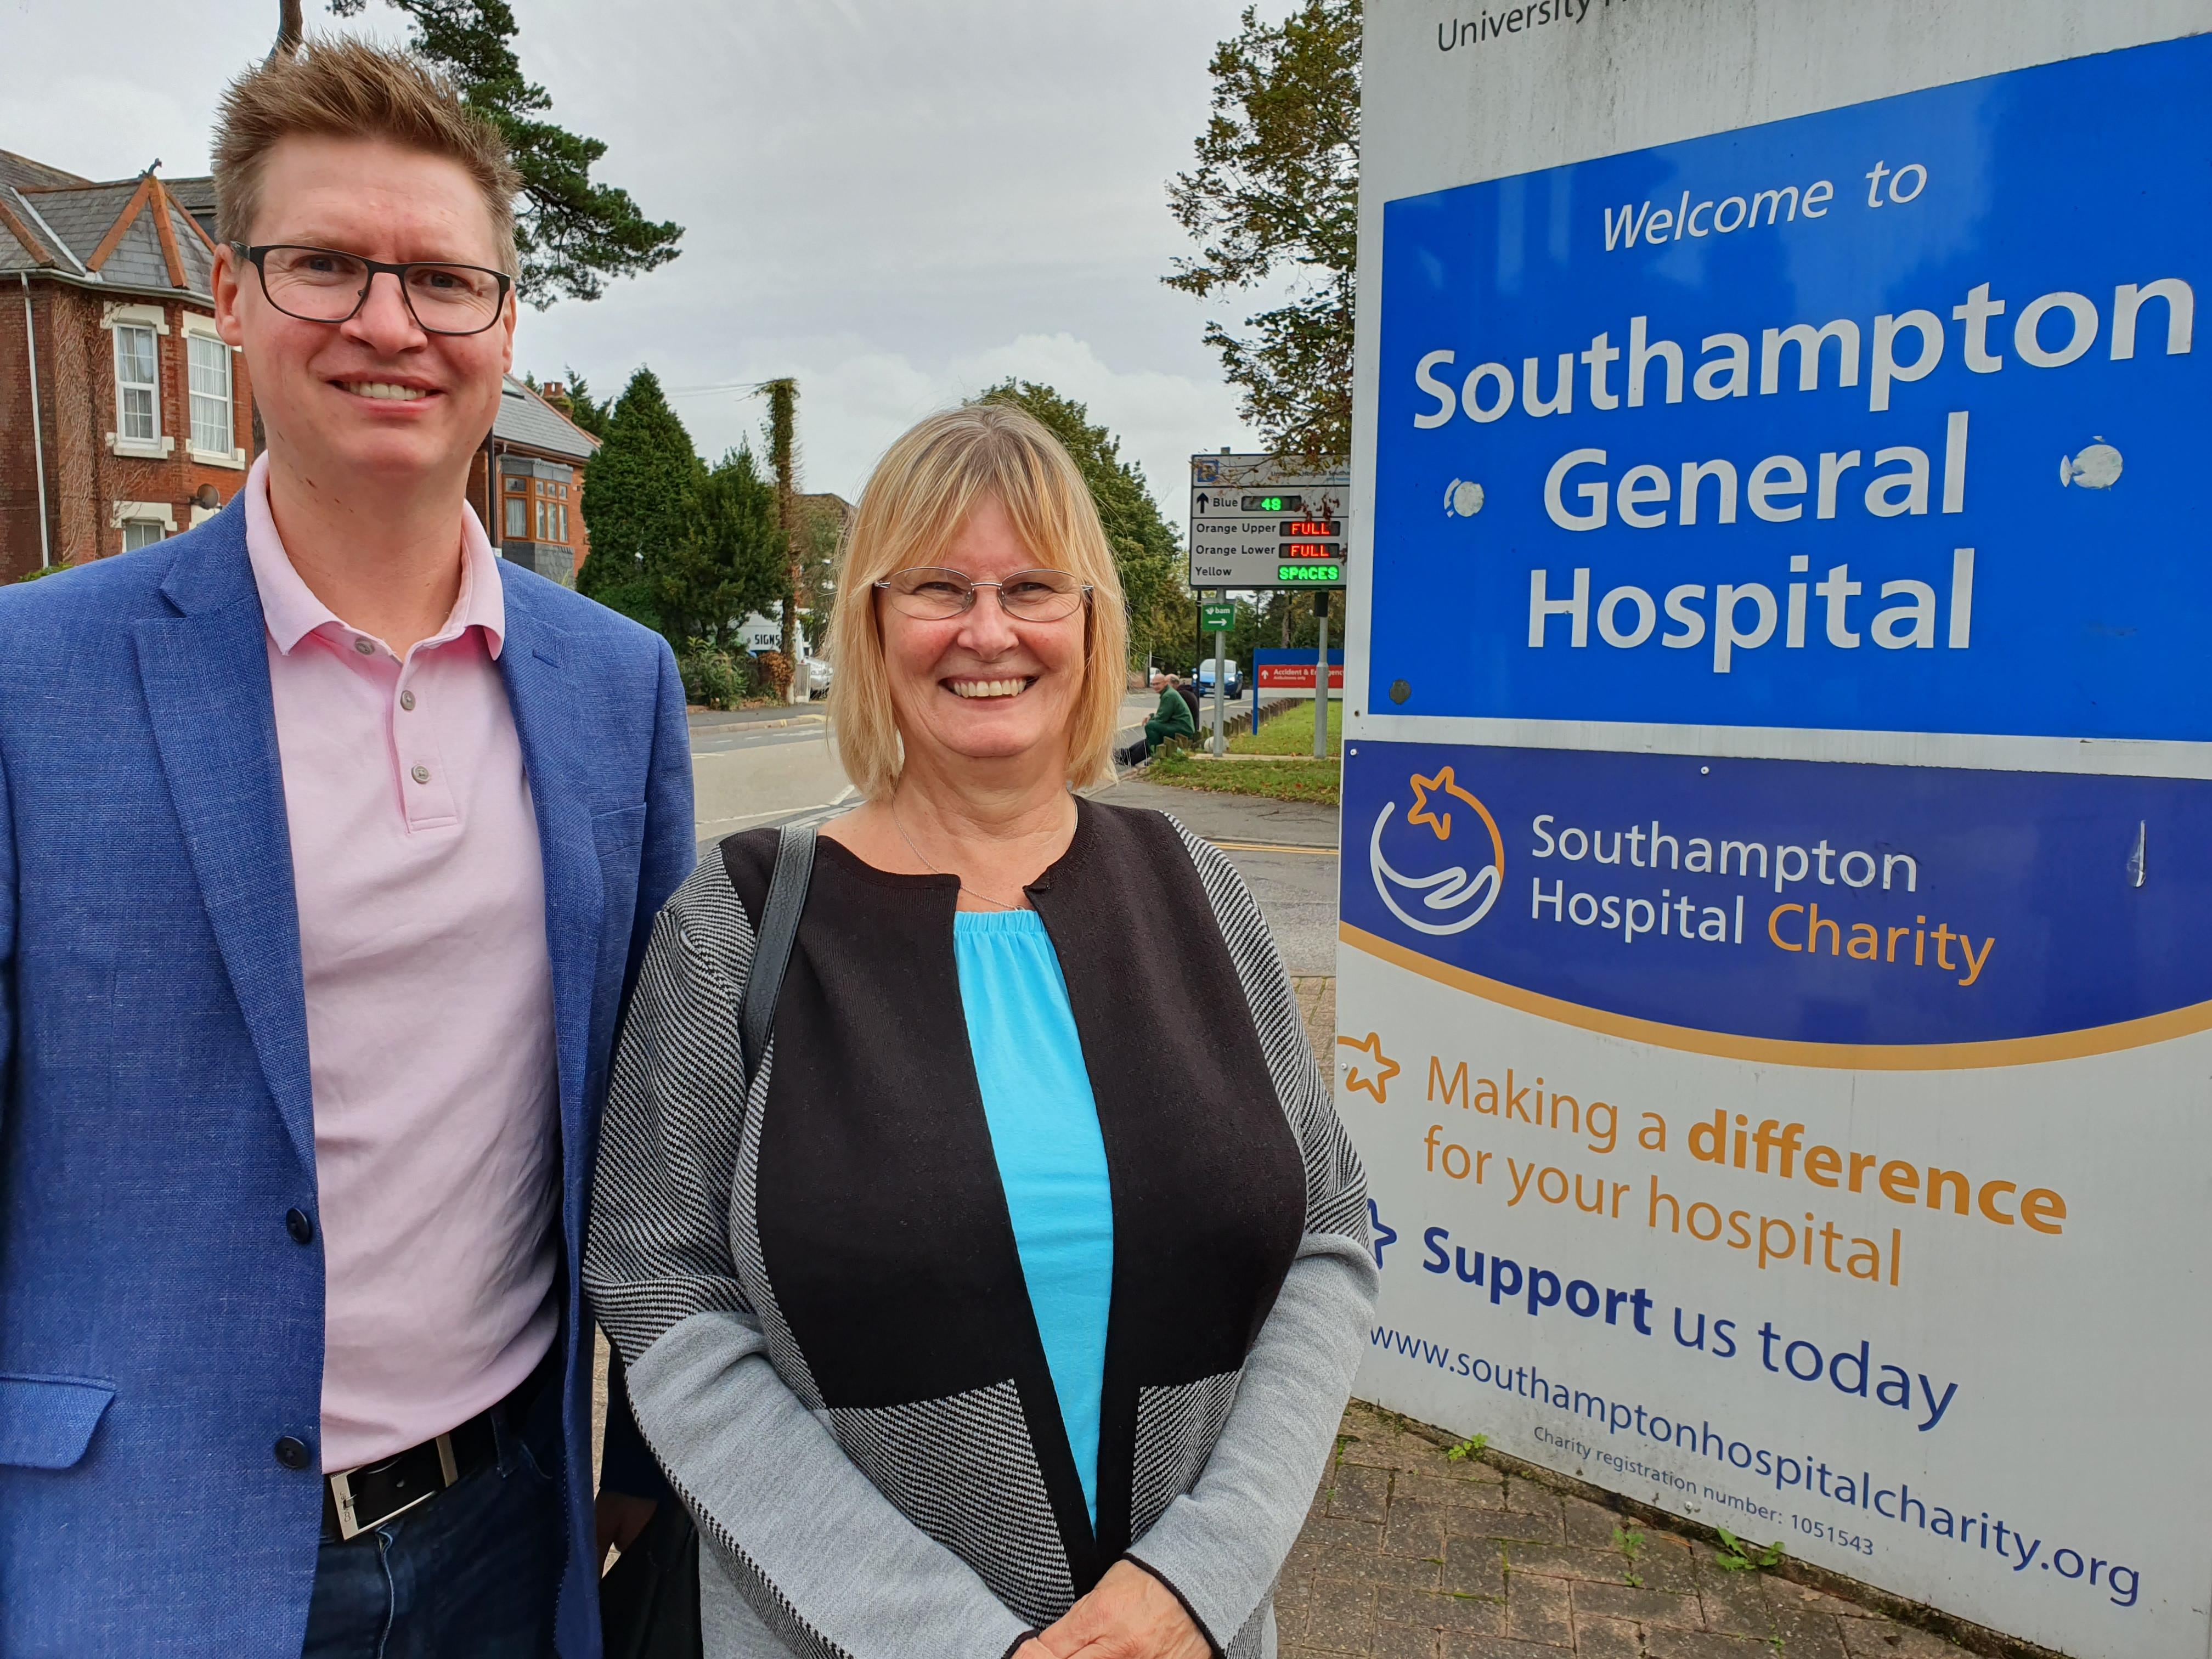 Diana and Steven Galton at Southampton General Hospital